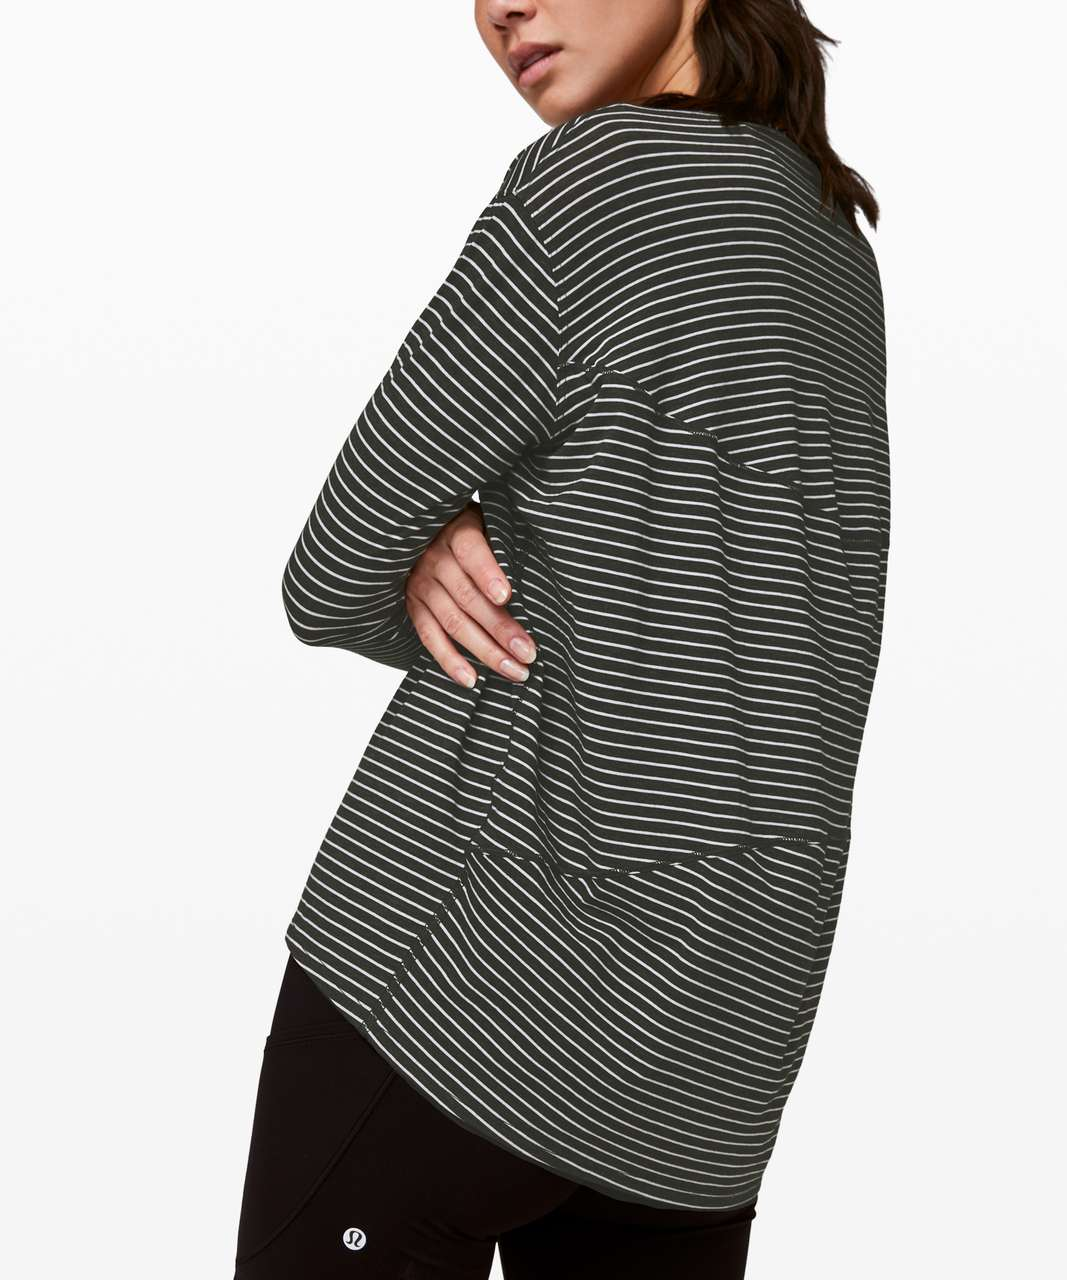 Lululemon Back In Action Long Sleeve - Modern Stripe Heathered Black White